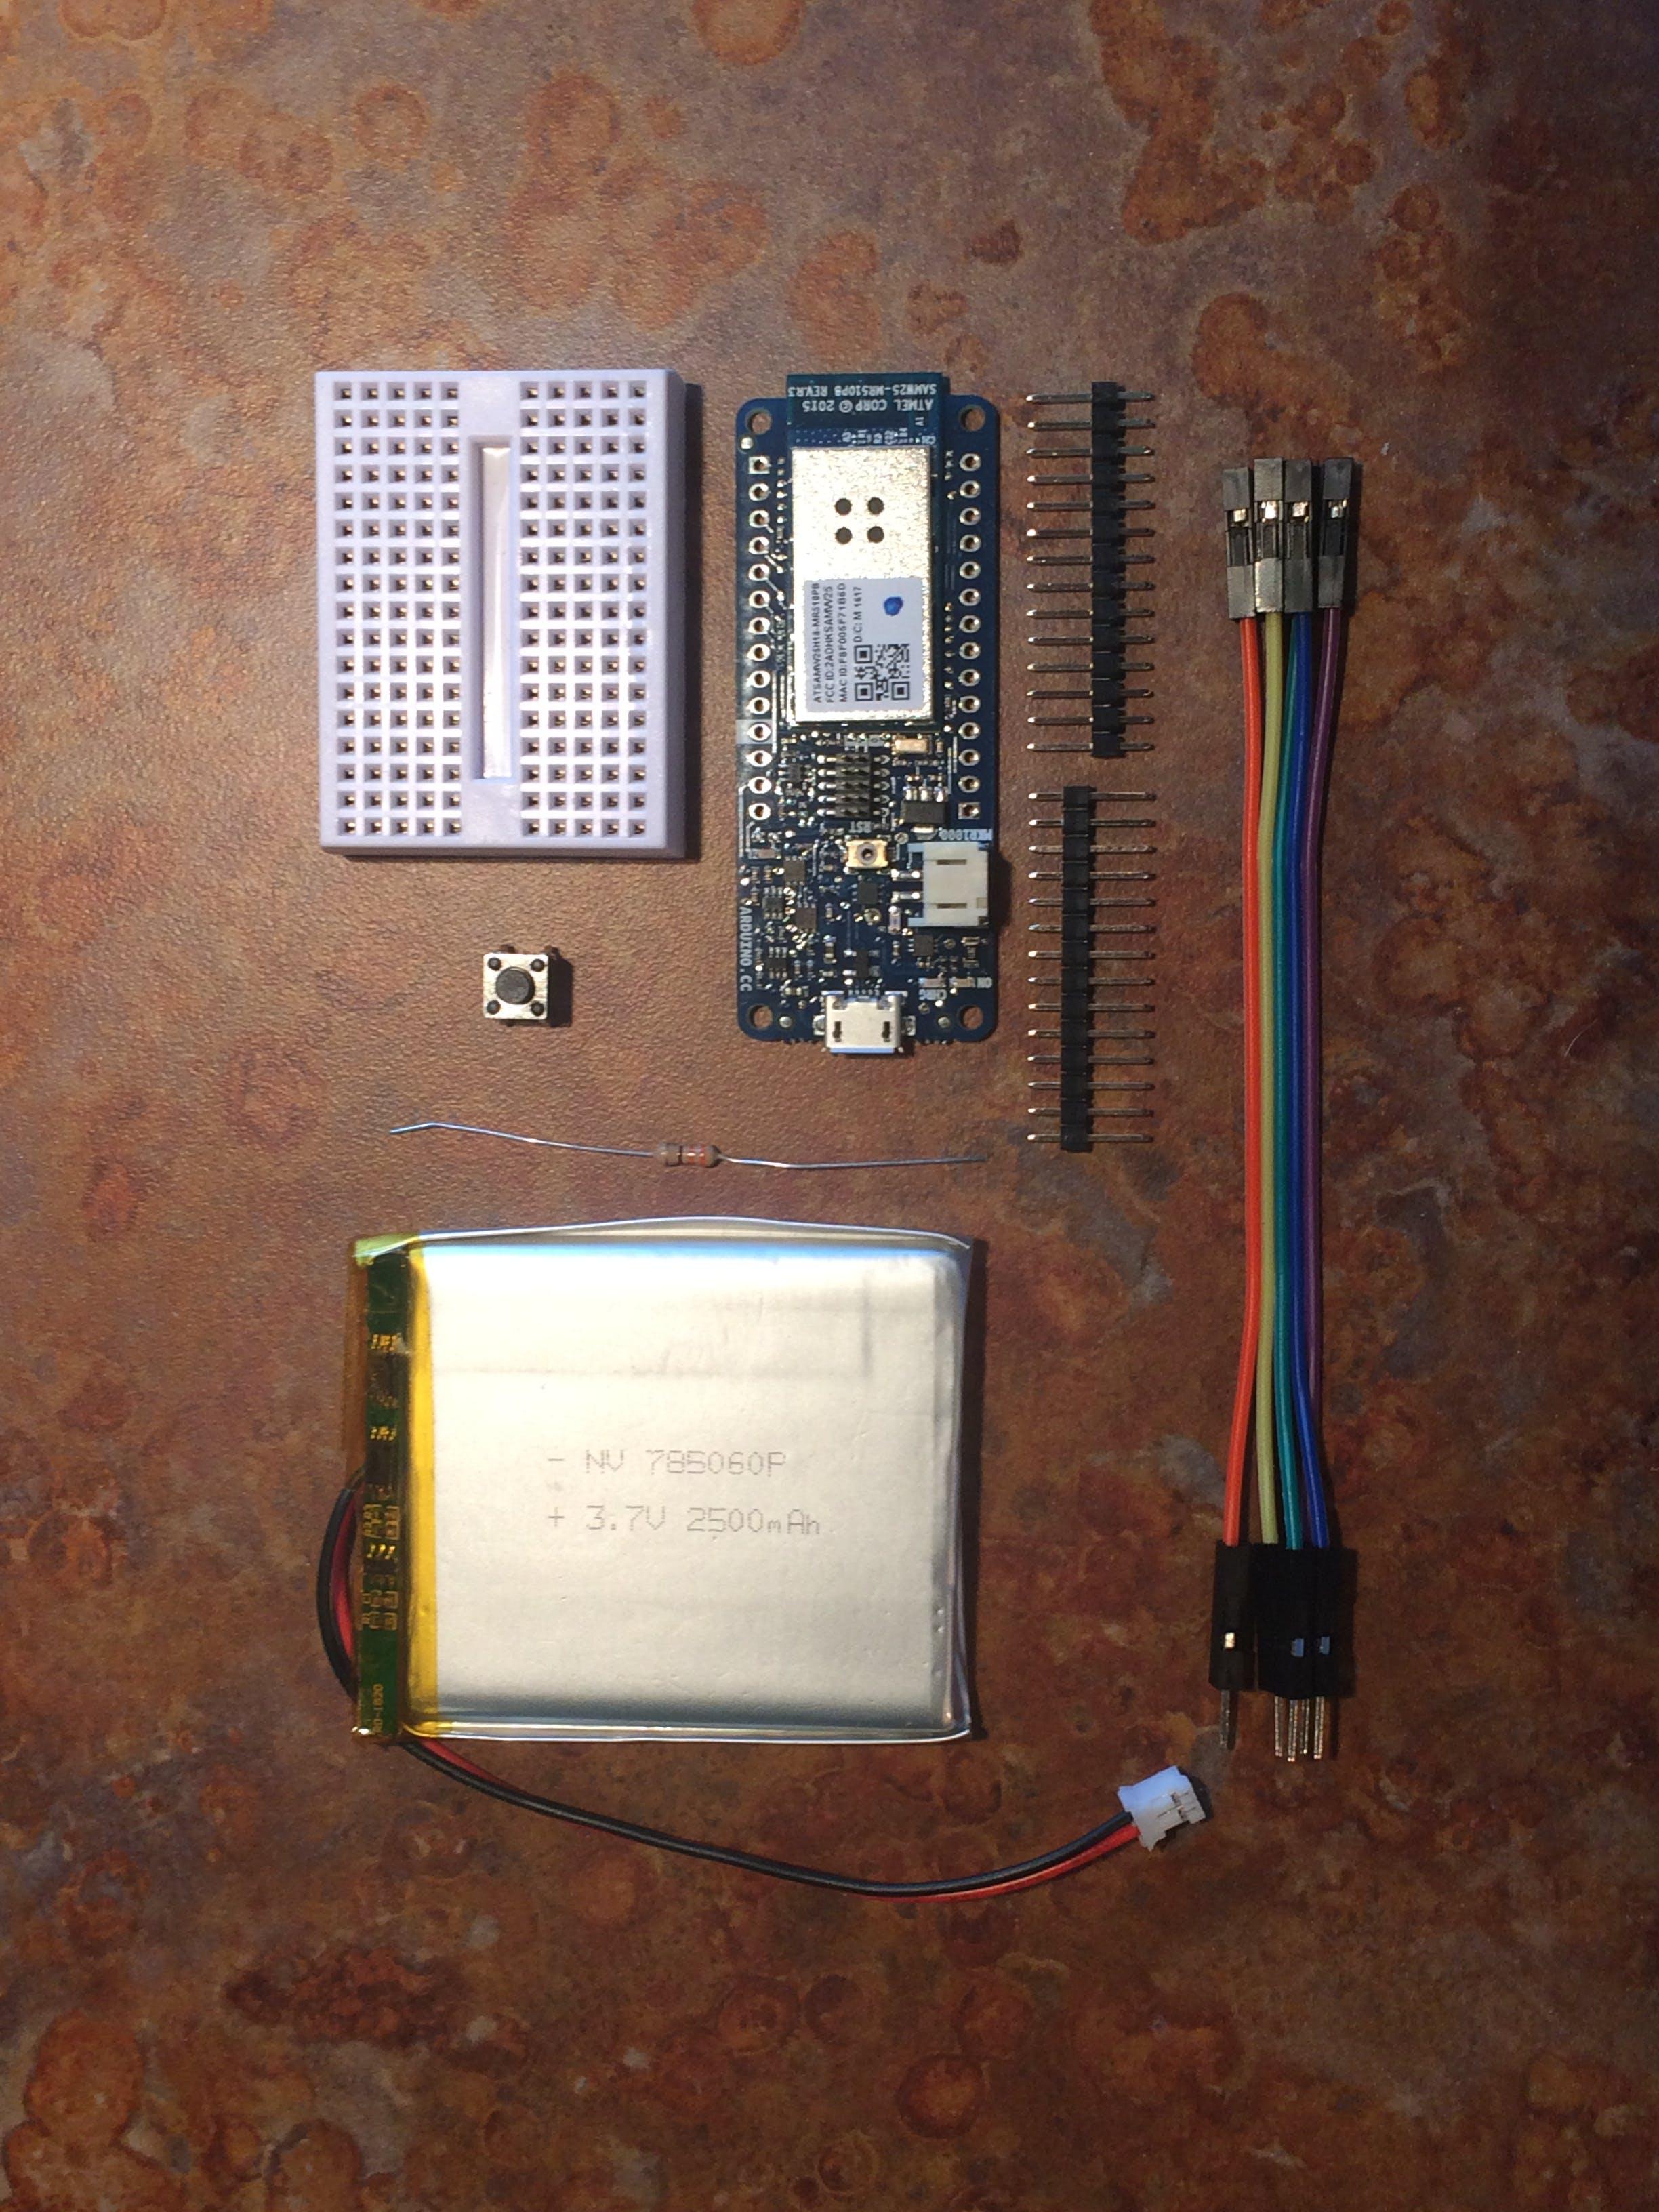 Arduino MKR1000 w/ header pins, push button, female-male jumpers, resistor LiPo battery, breadboard